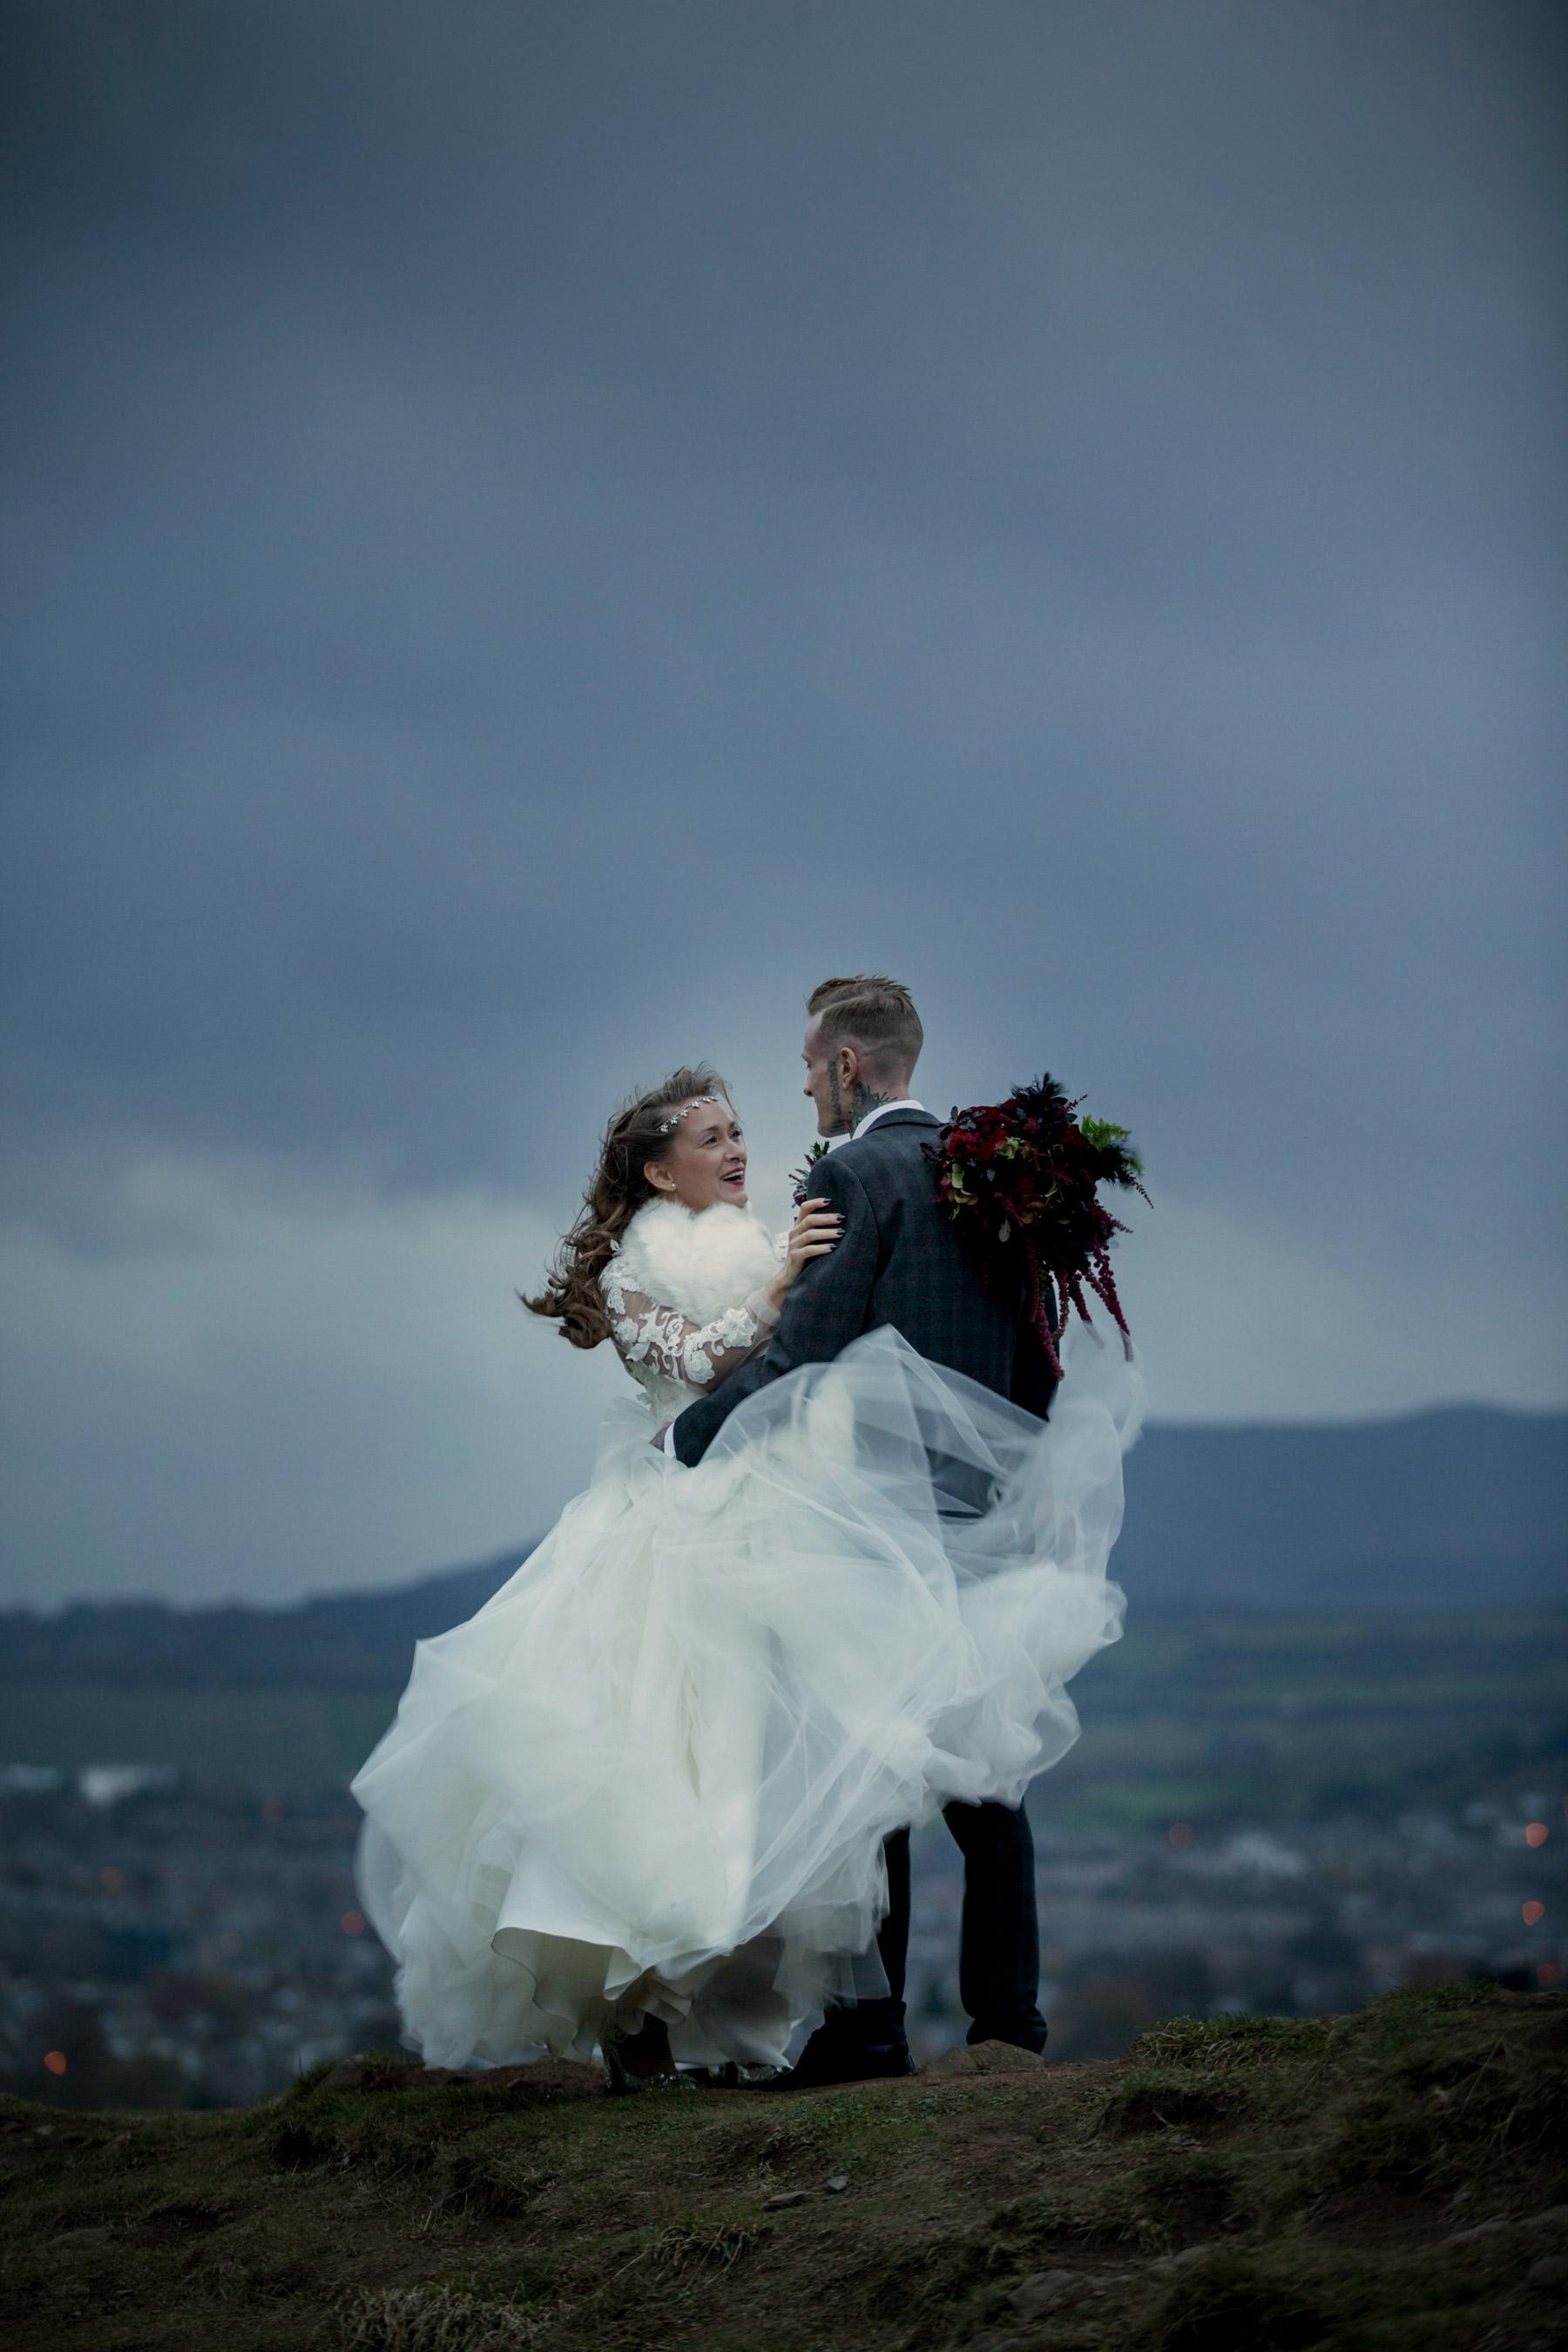 windy wedding portraits in scotland